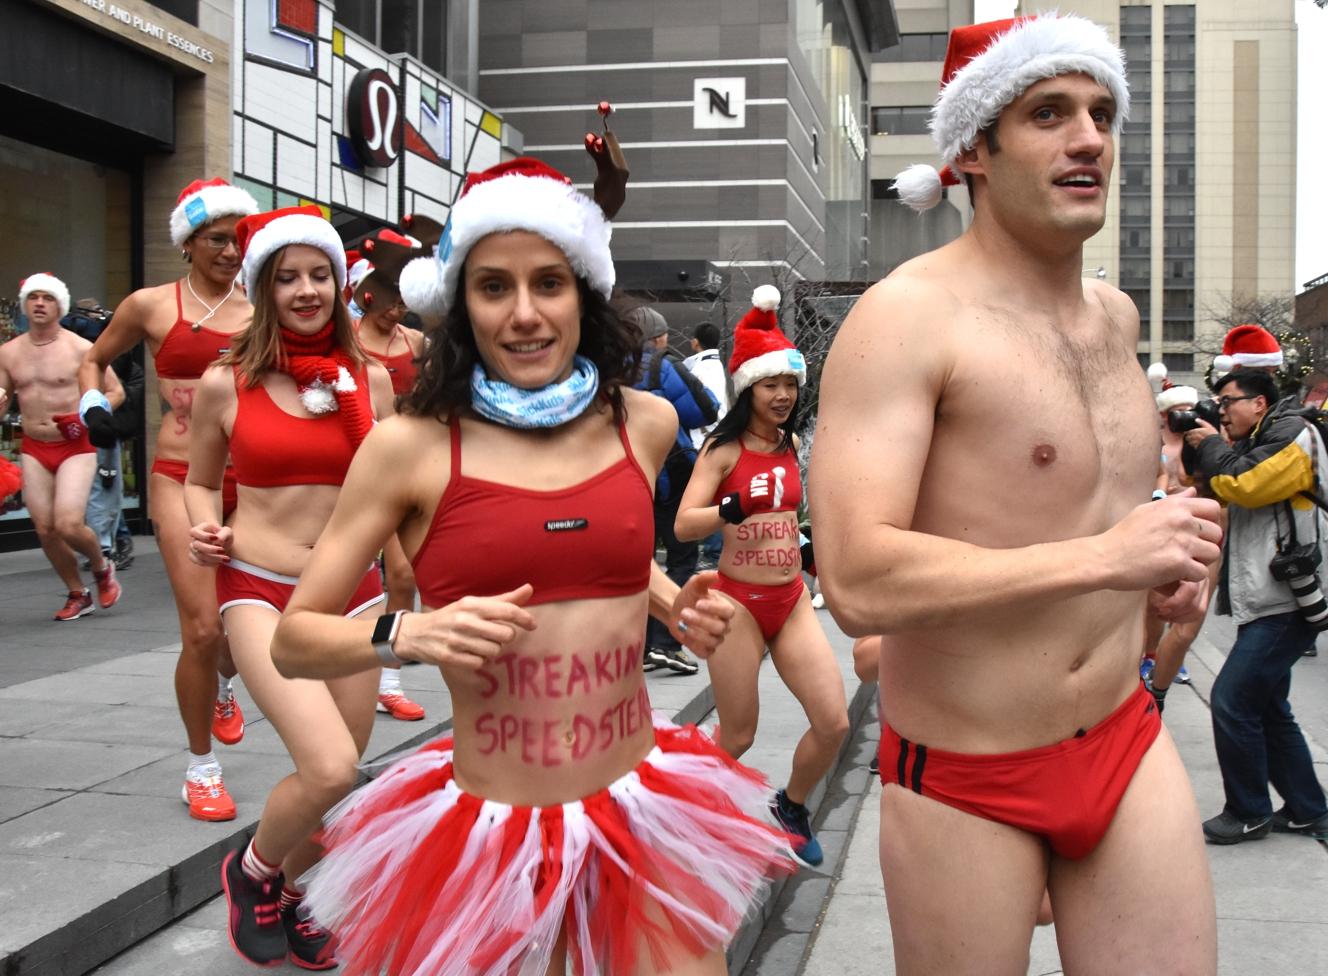 Toronto Gay Porn Stars